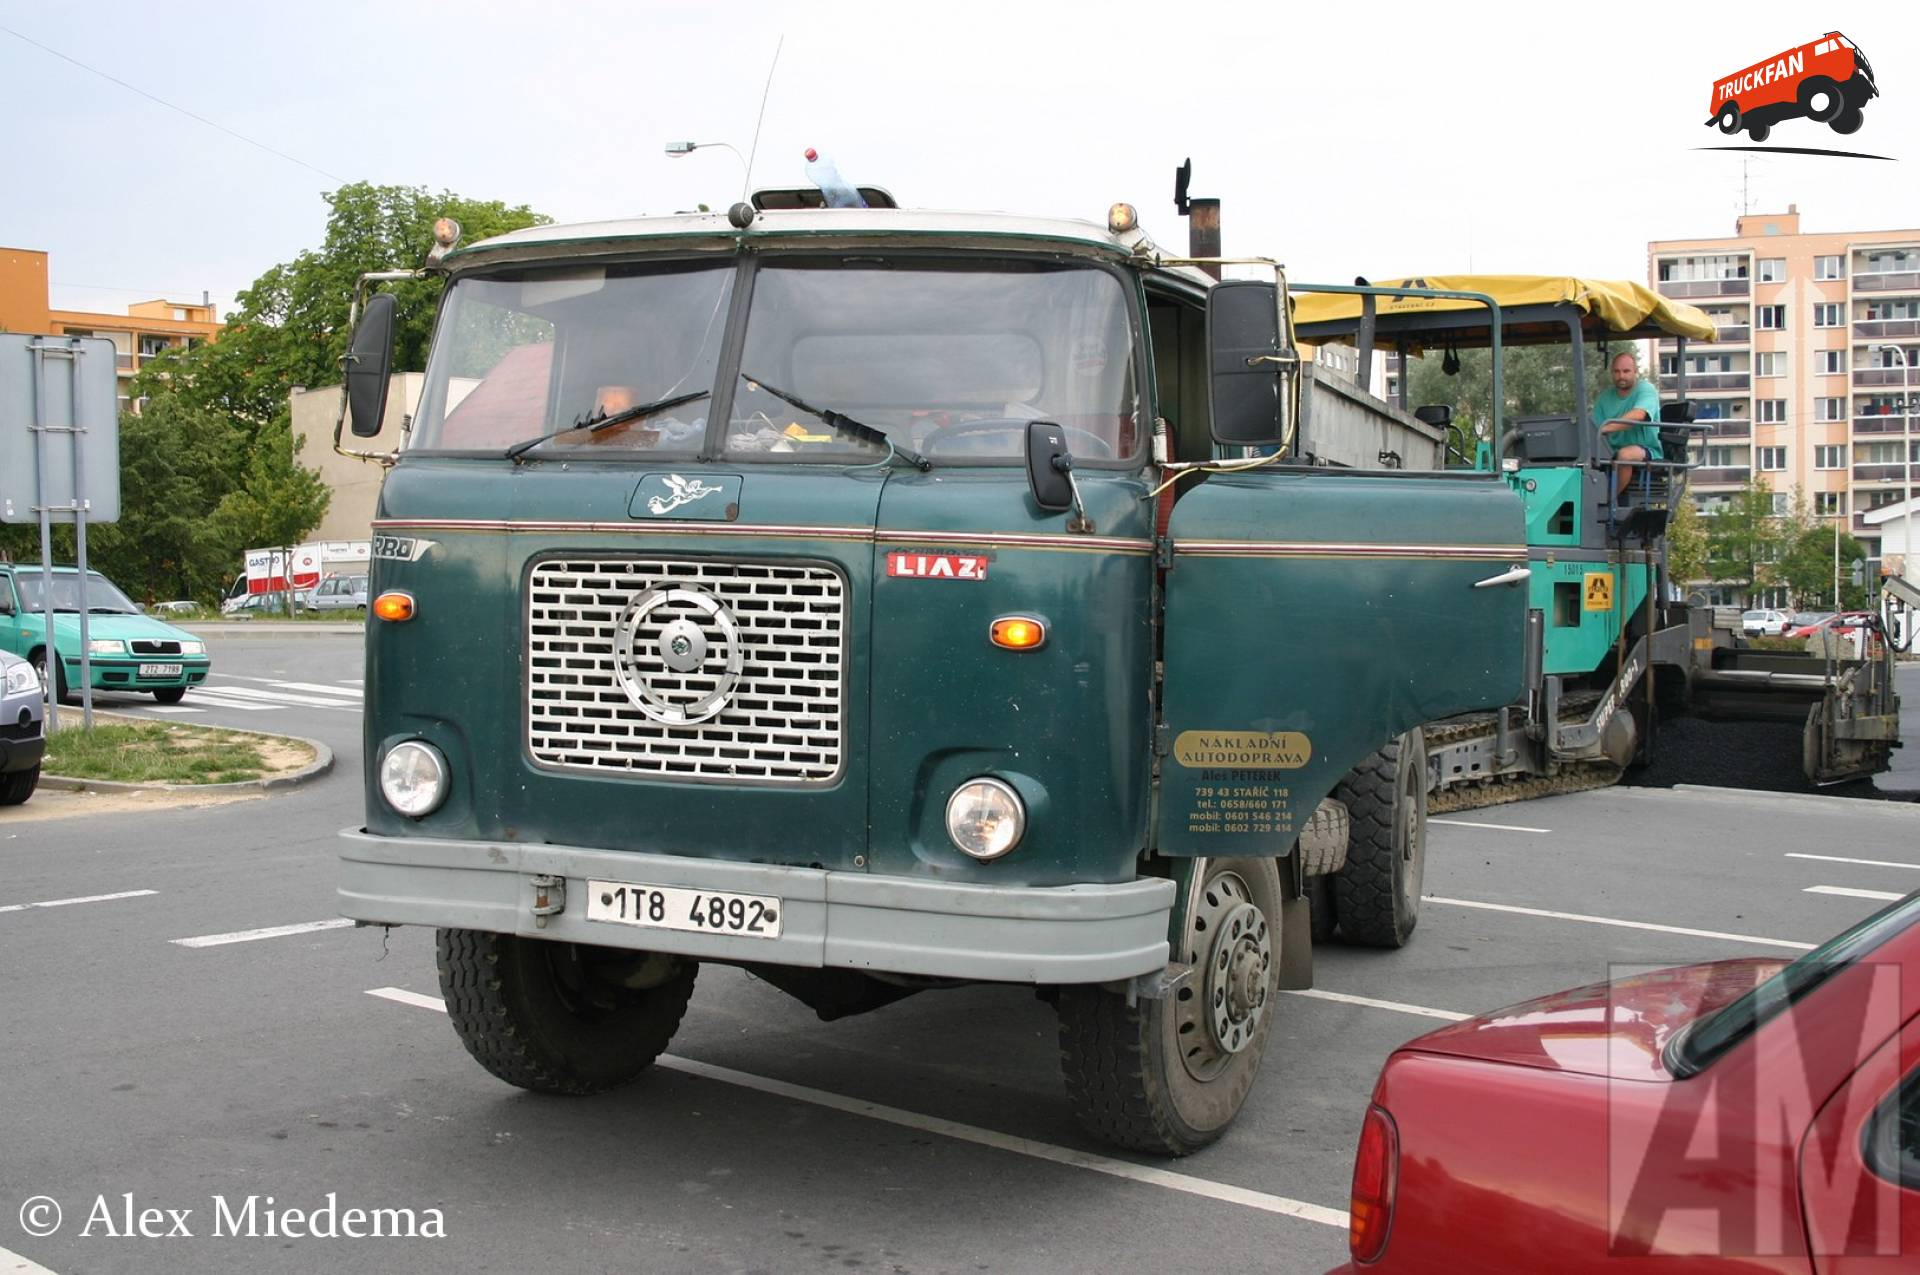 LIAZ 706